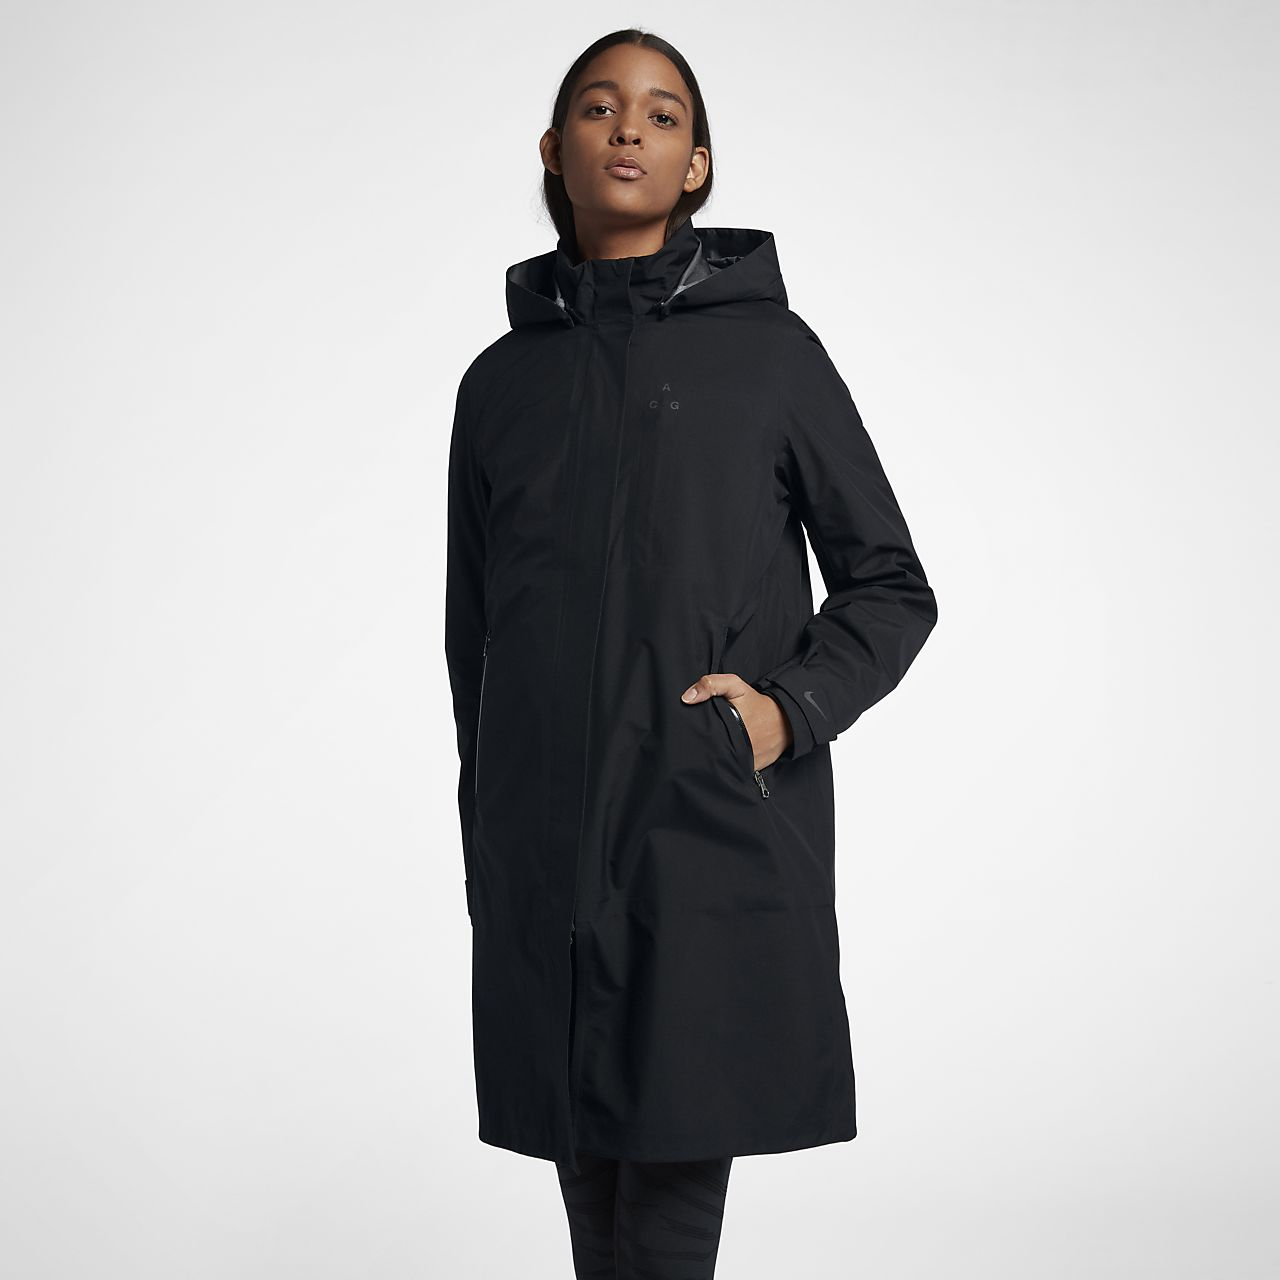 ... NikeLab ACG 3-in-1 System Women's Coat